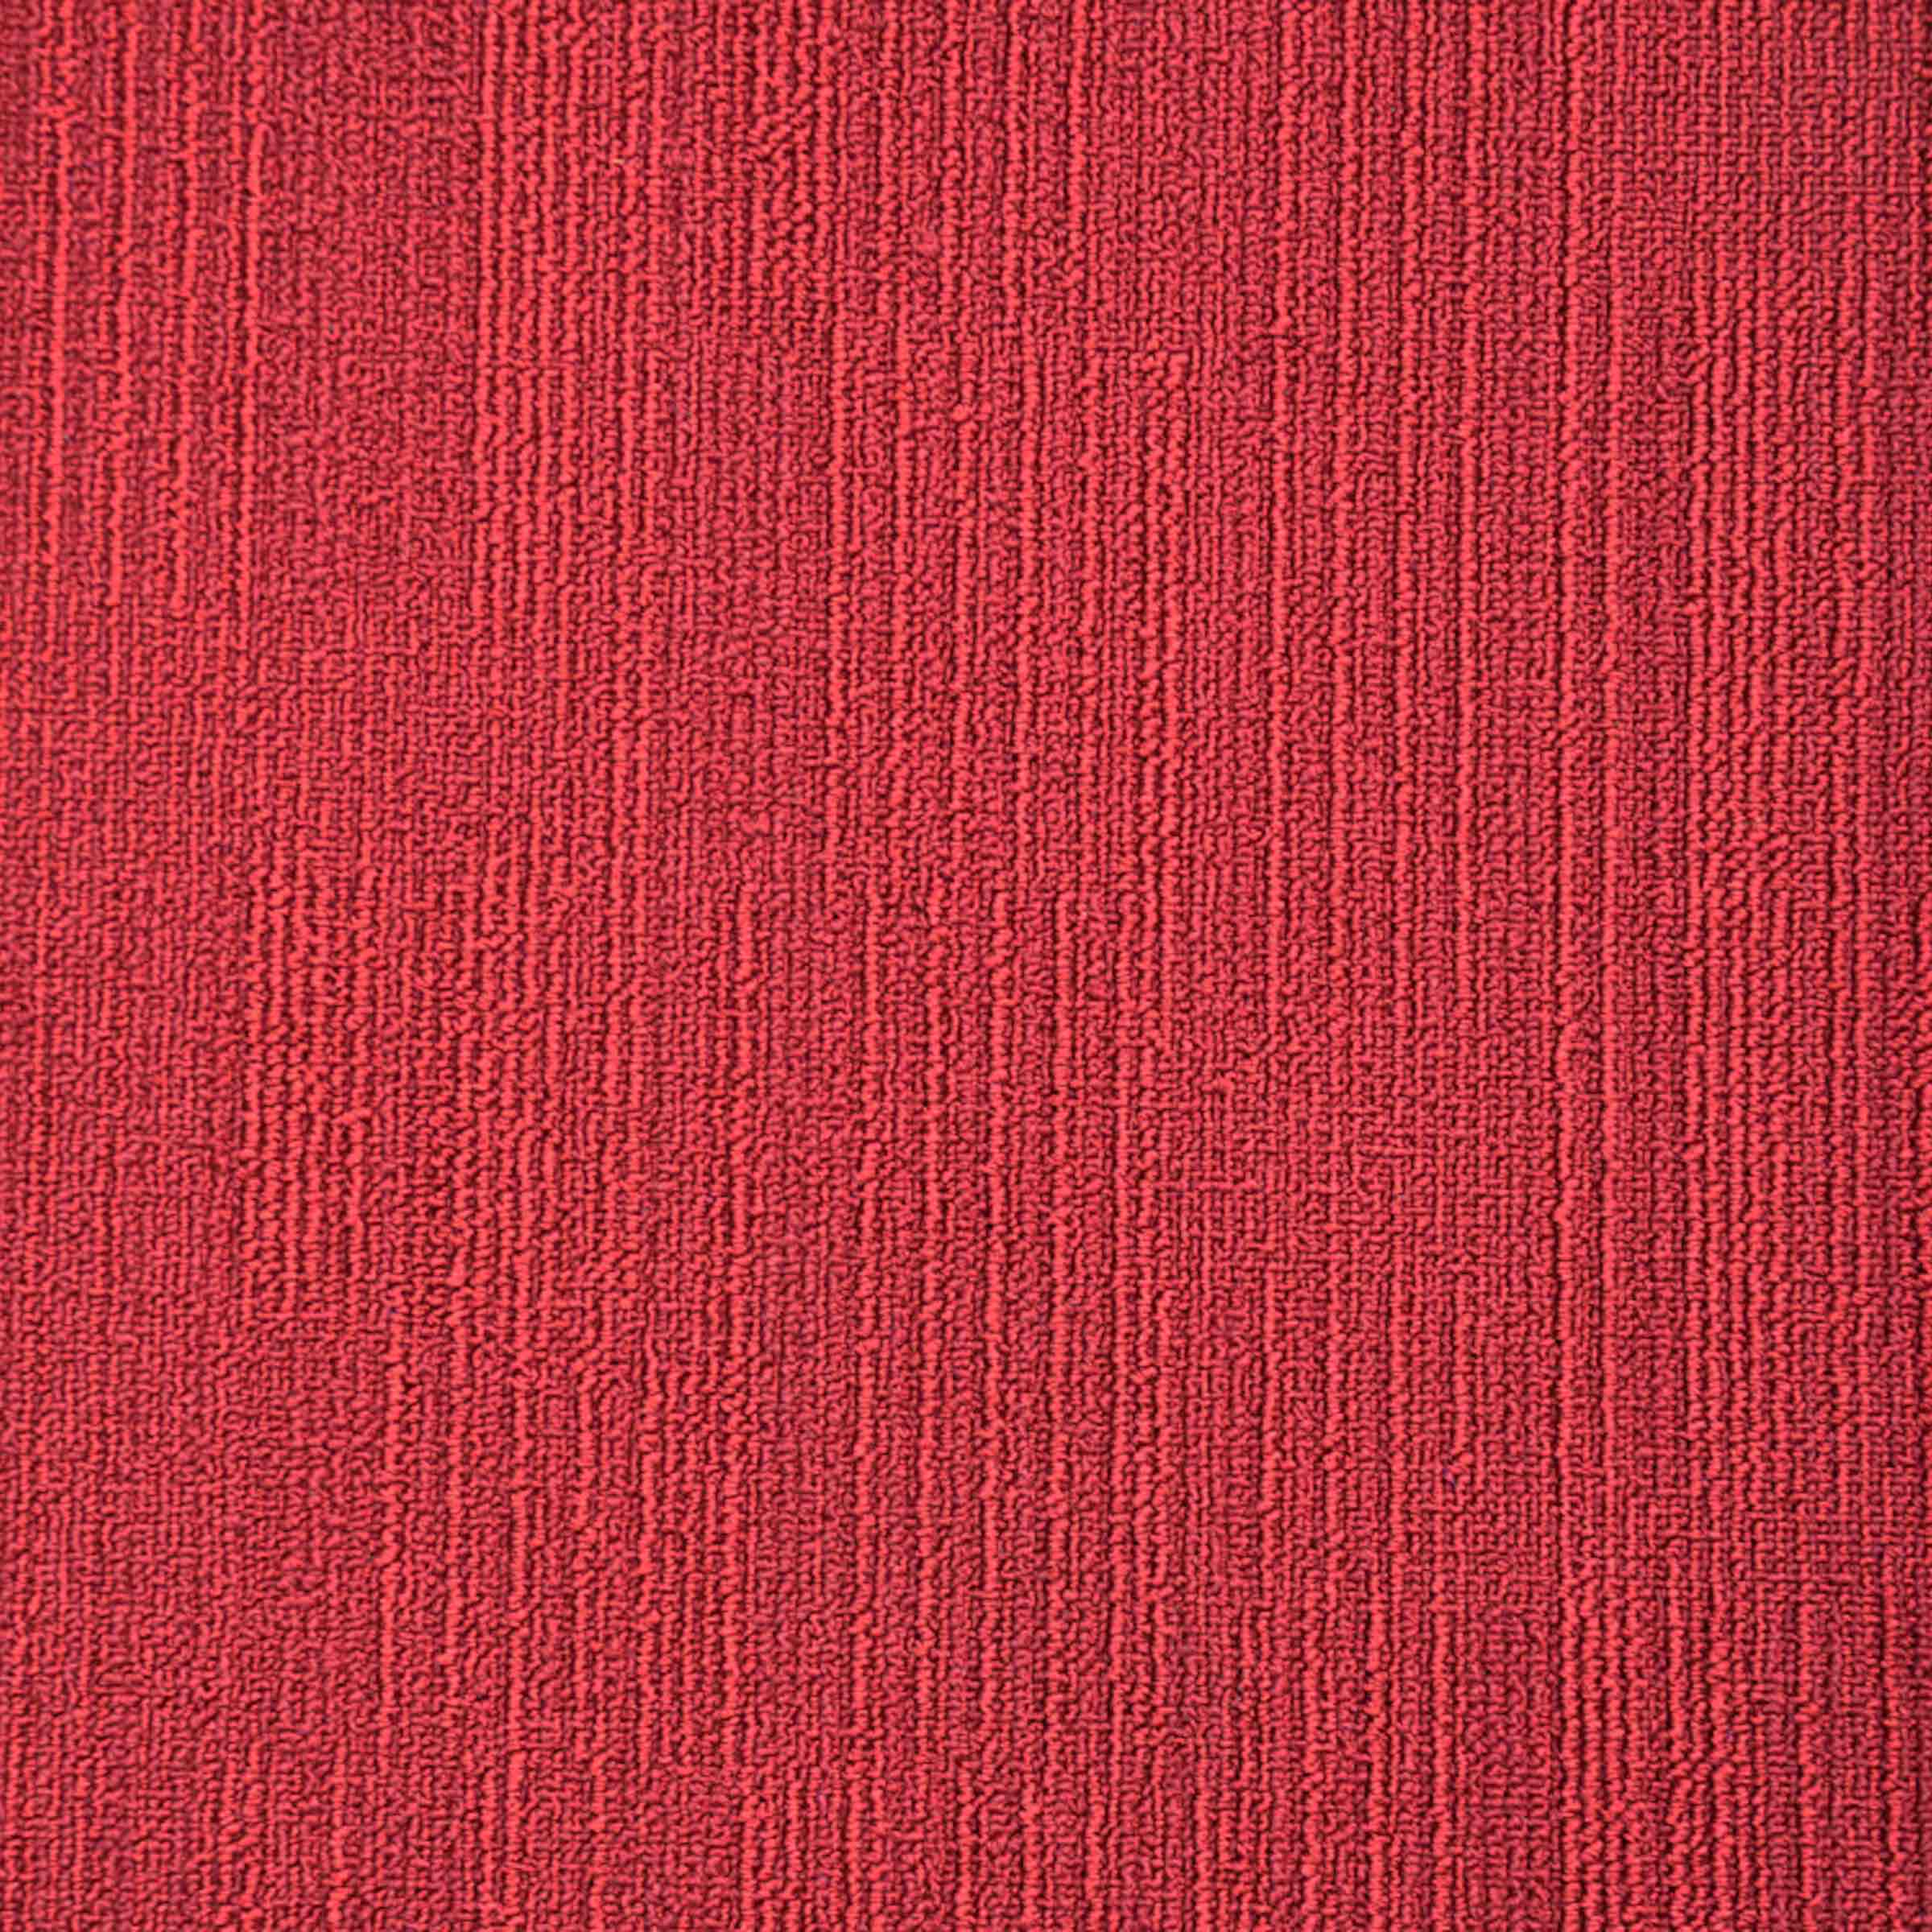 Highlights 3 Multi-Level | 23953 | Paragon Carpet Tiles | Commercial Carpet Tiles